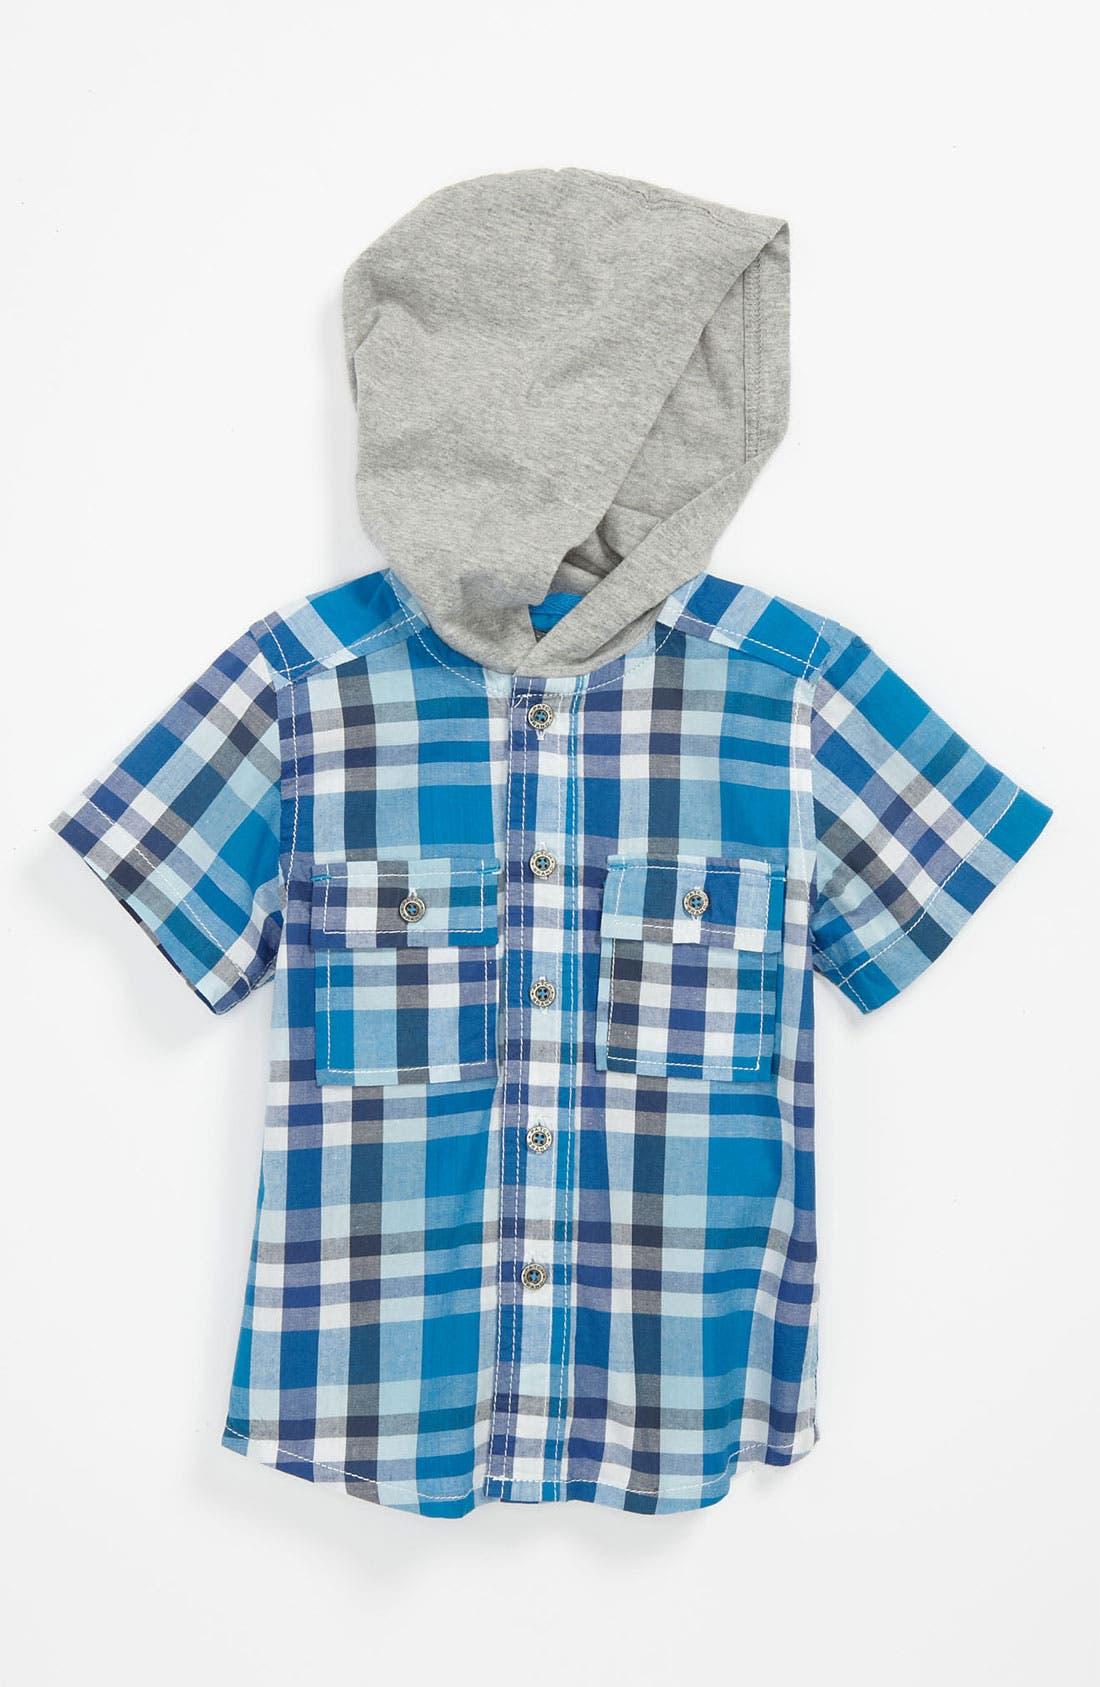 Main Image - Pumpkin Patch Hooded Shirt (Toddler)